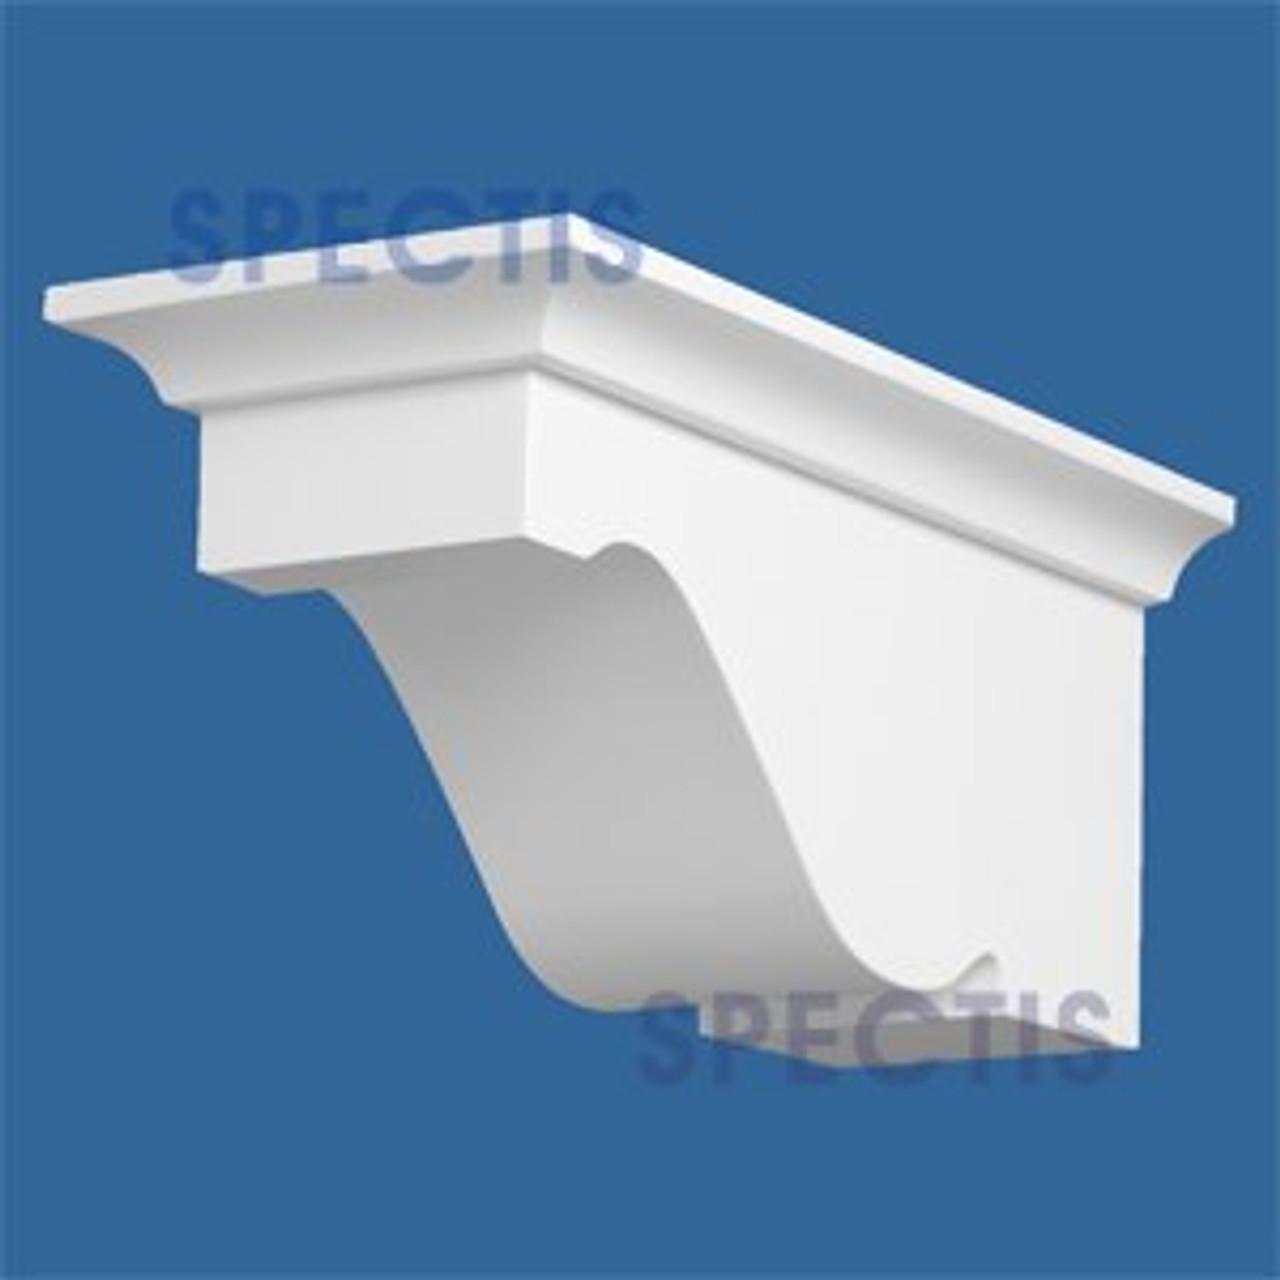 "BL2911 Corbel Block or Eave Bracket 5.5""W x 5.5""H x 12"" P"